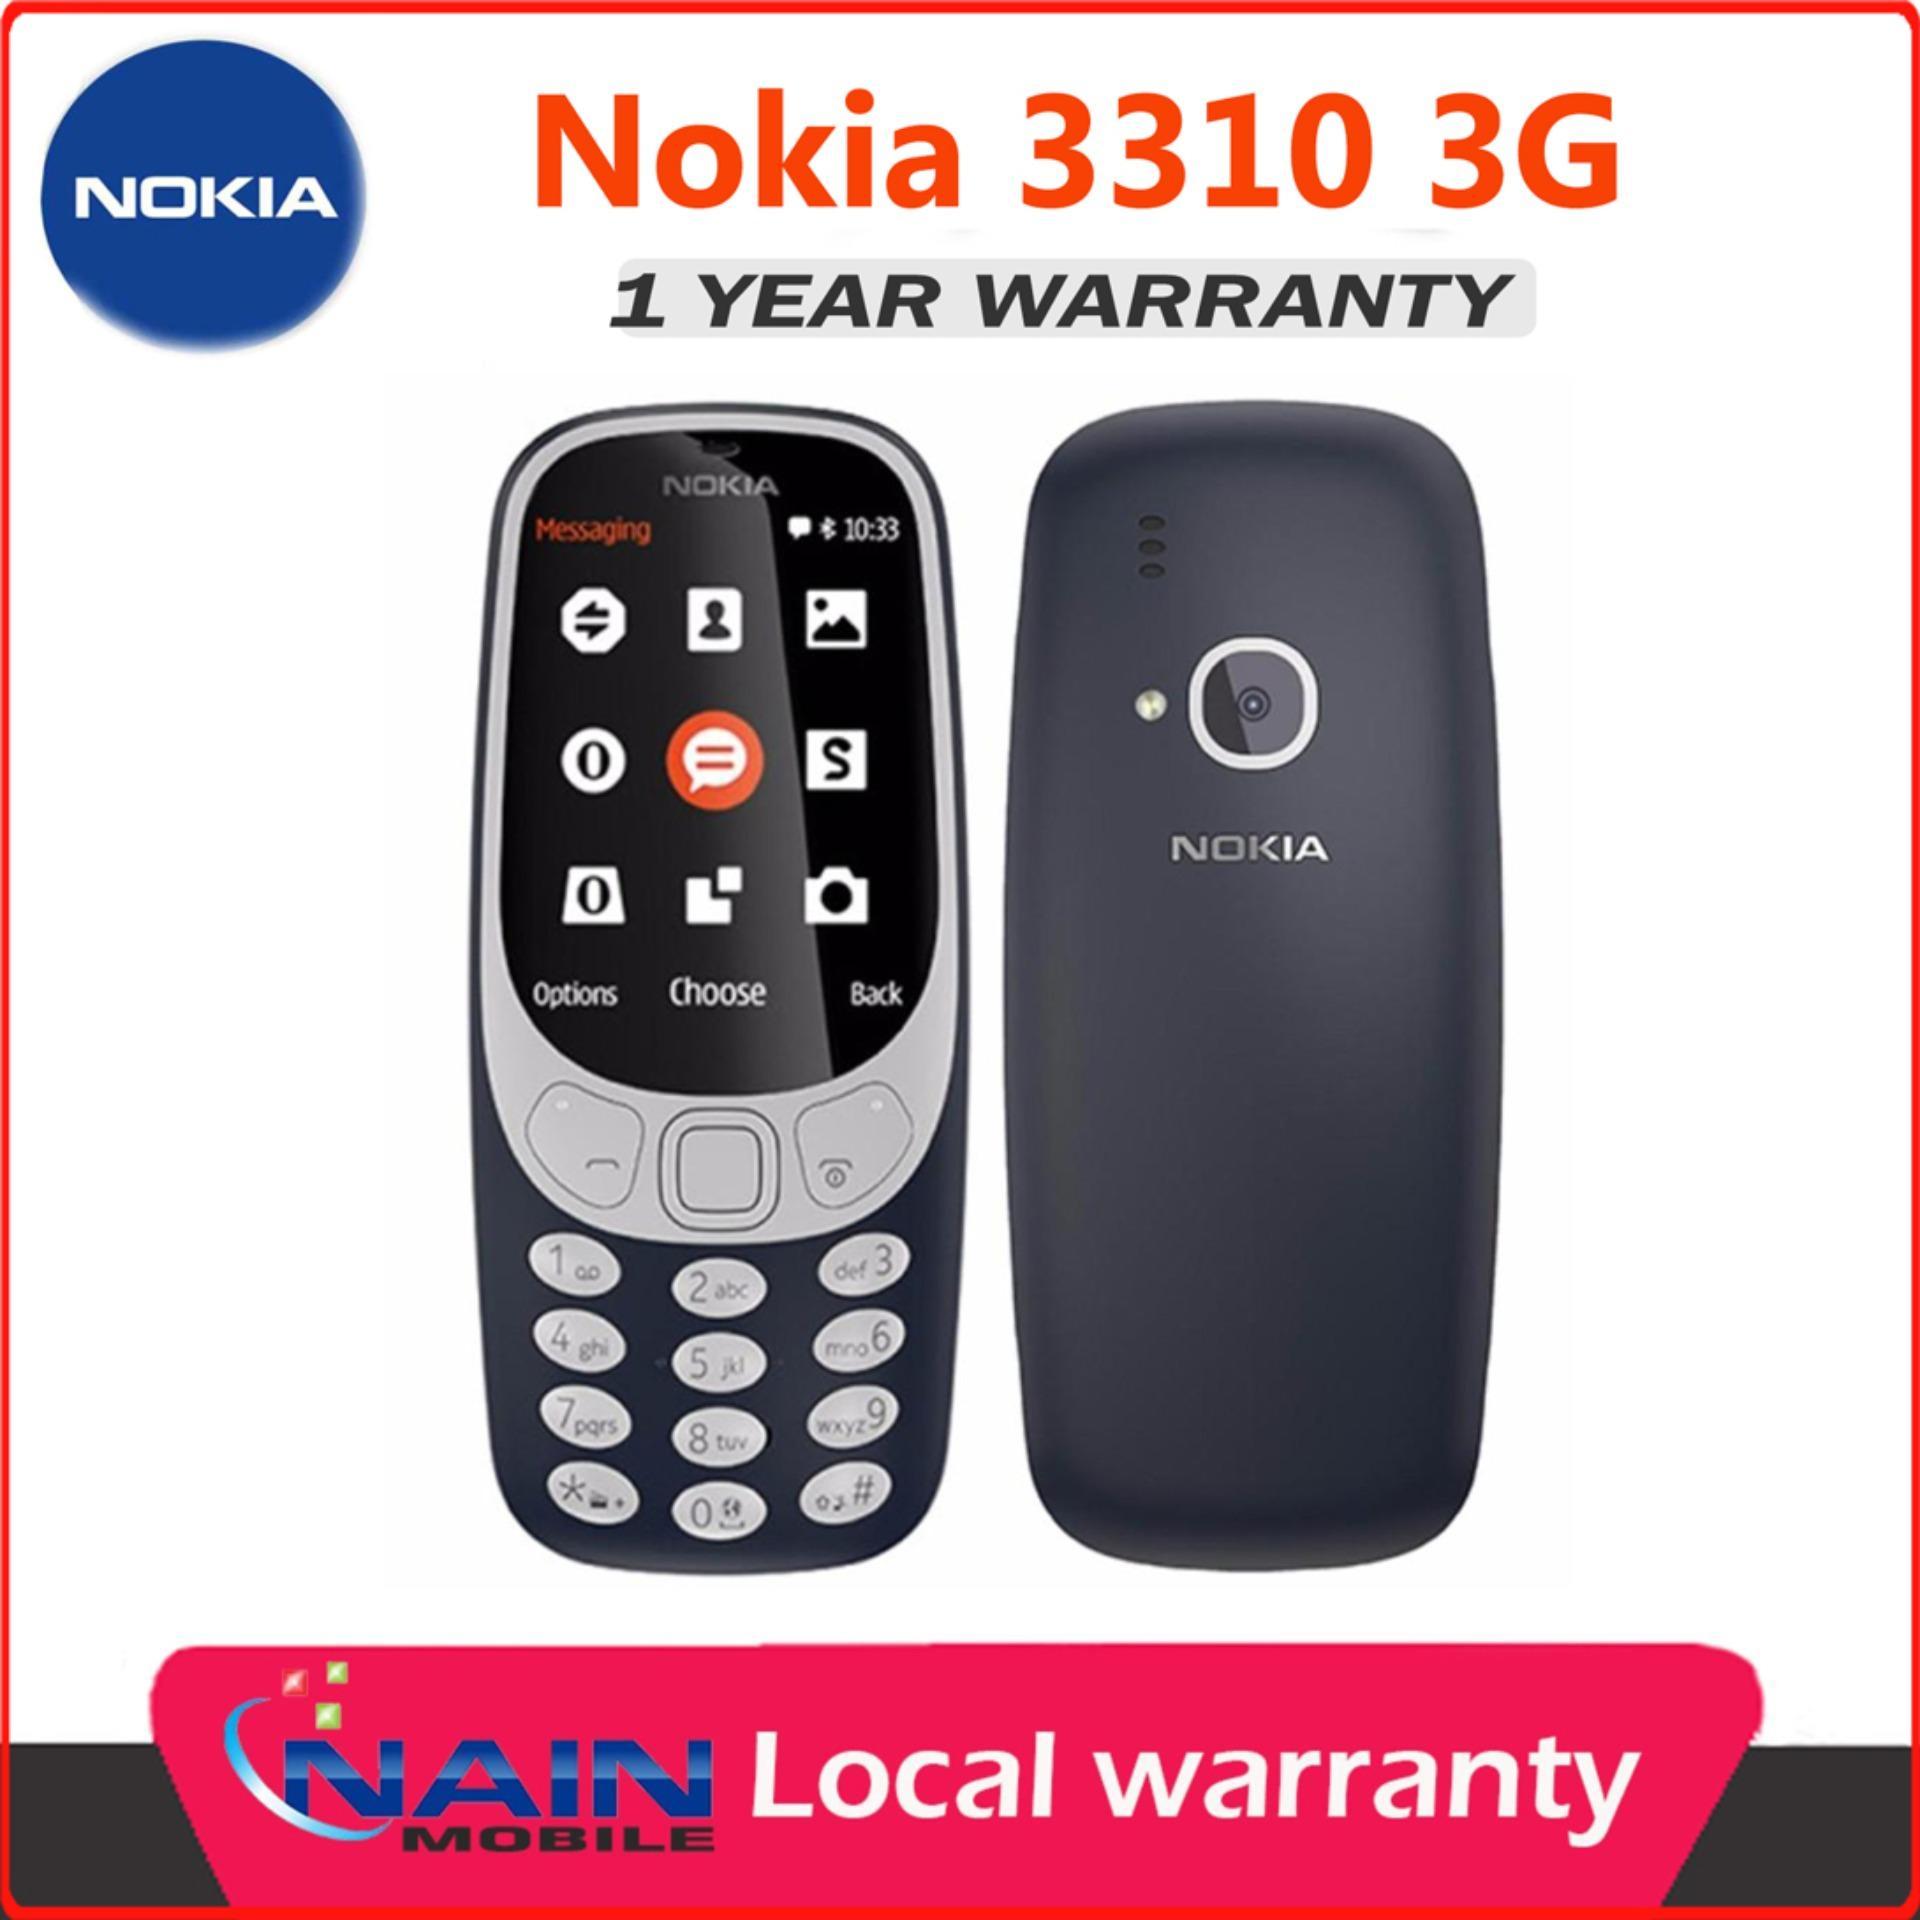 Nokia Singapore - Shop Nokia Phones Online At Best Price